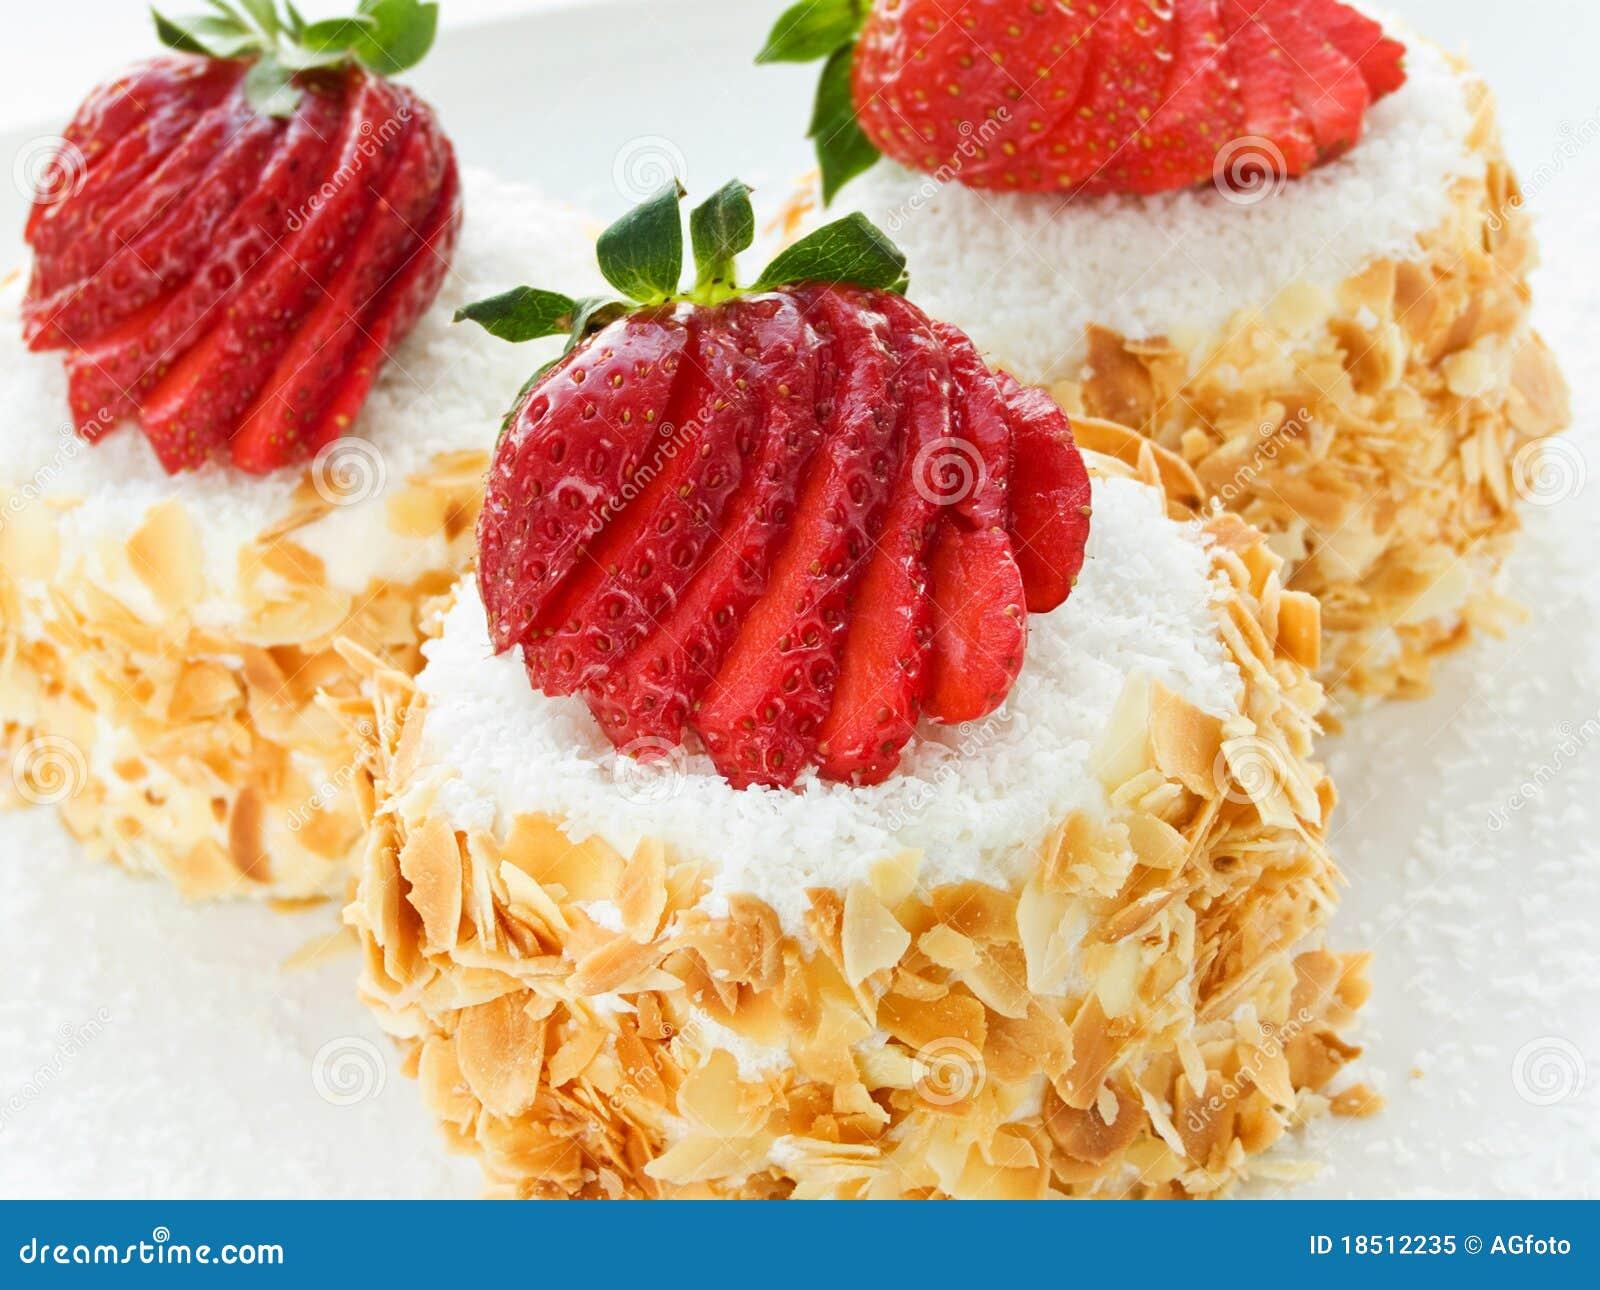 Strawberry Dessert Royalty Free Stock Photo Image 18512235